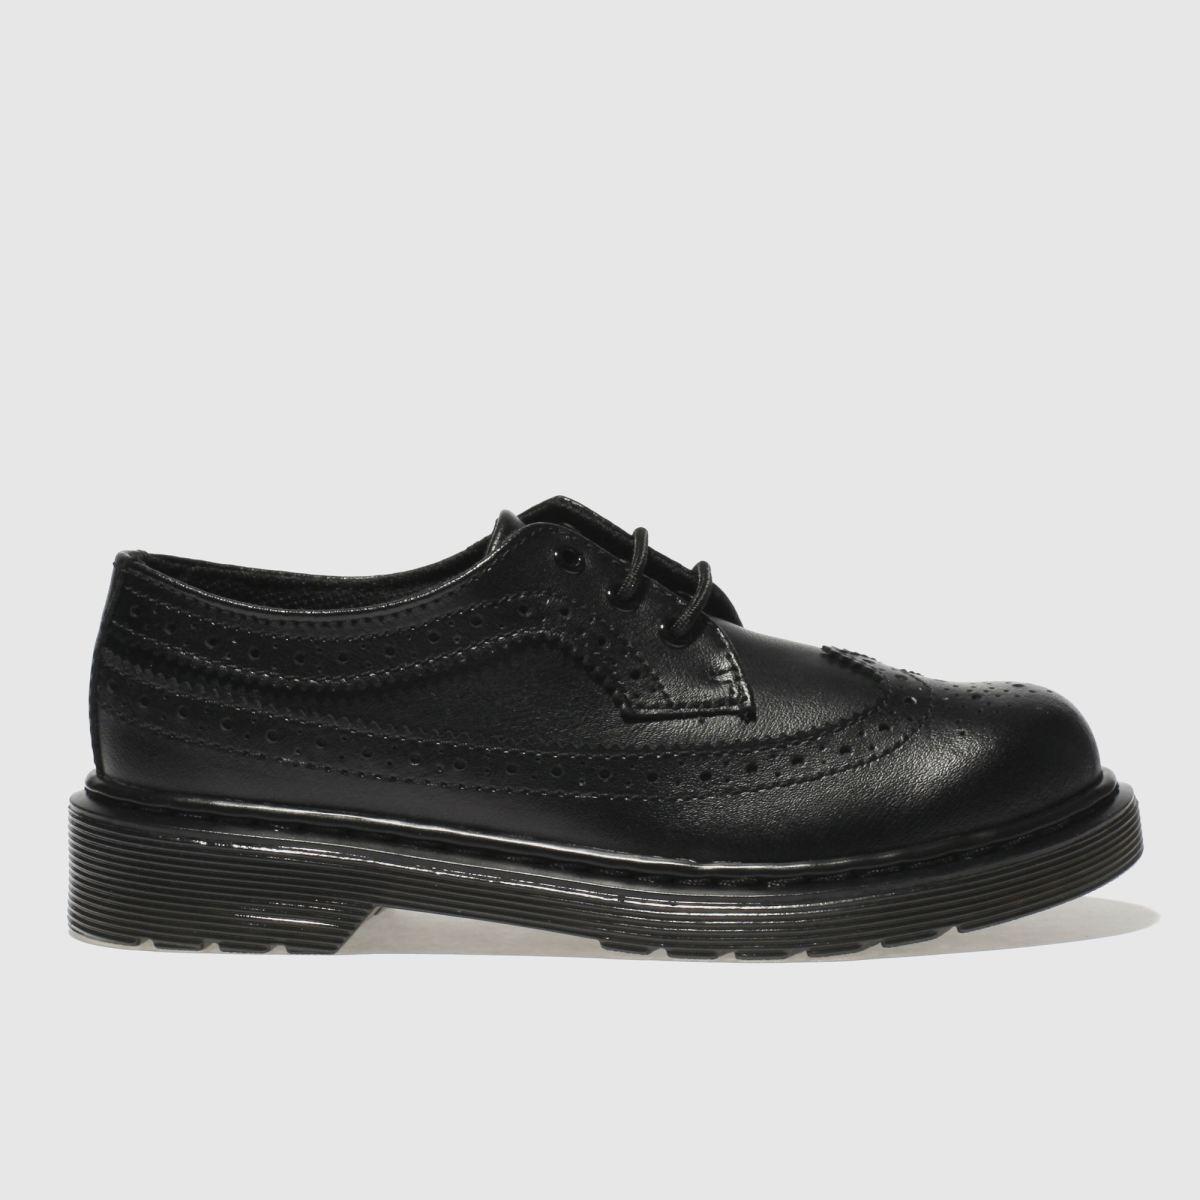 Dr Martens Black989 Boots Junior